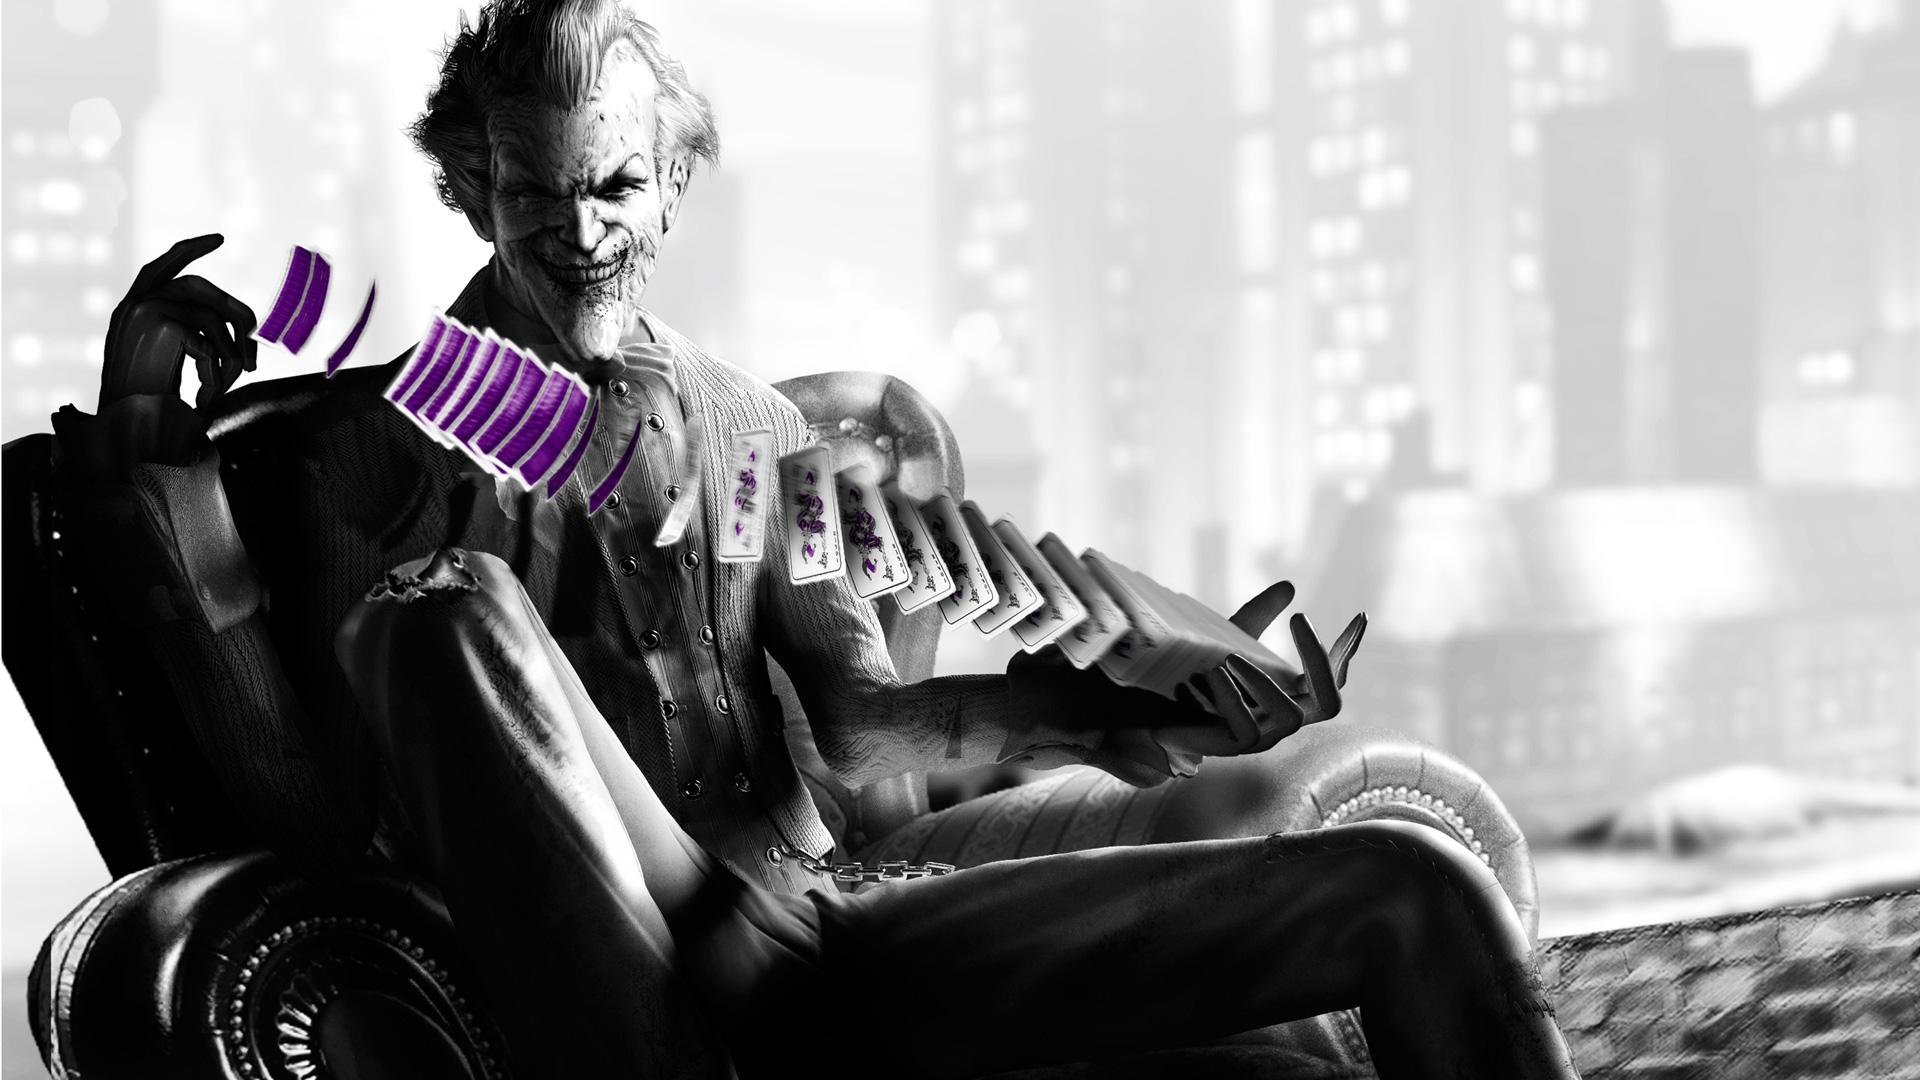 Batman Arkham City Recenze 8799